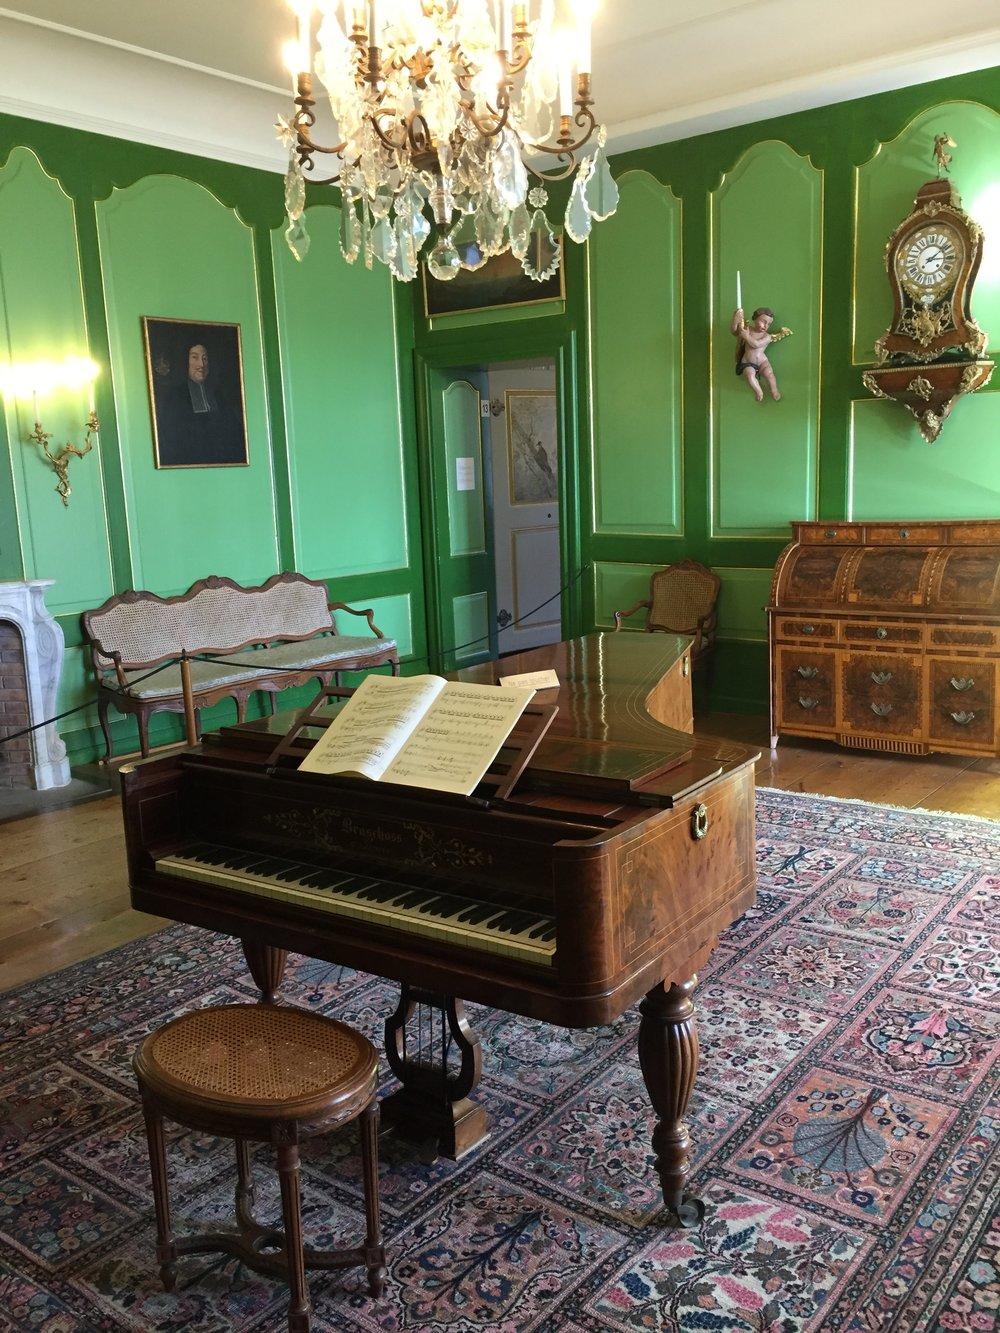 The music salon in the castle